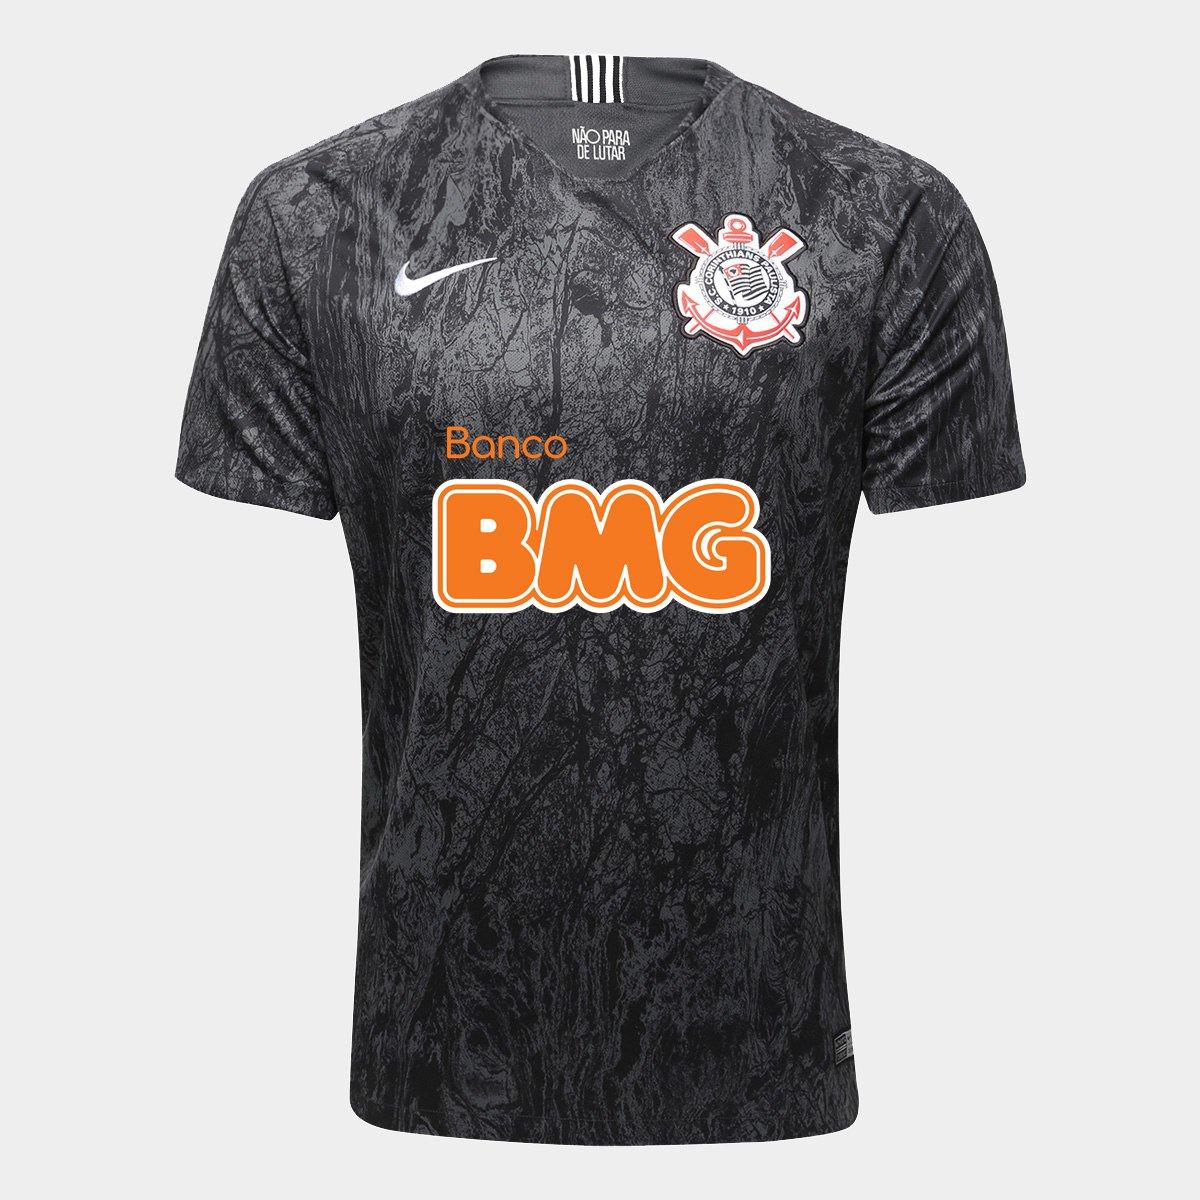 Camisa Corinthians II 18 19 s n° Patrocínio BMG Torcedor Nike Masculina - c313453a1e0b5